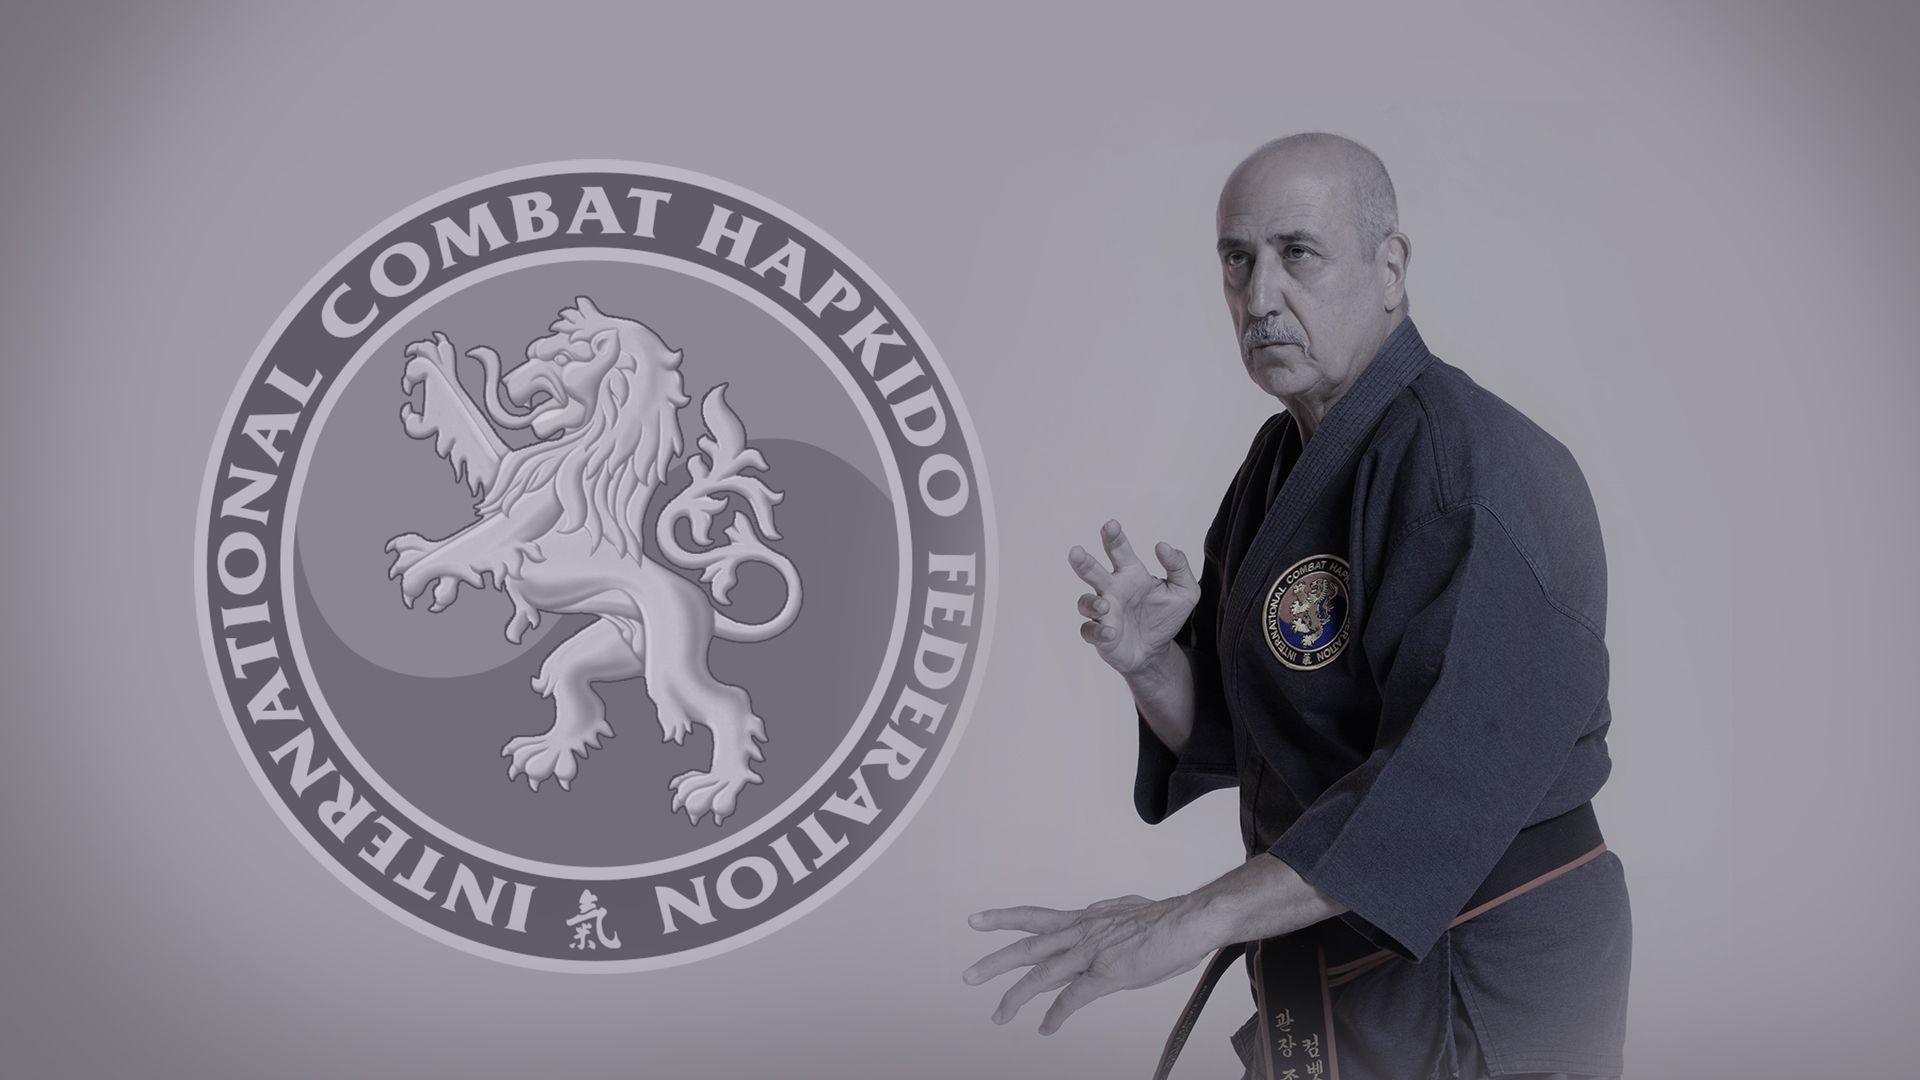 International Combat Hapkido Federation Dsi Inc